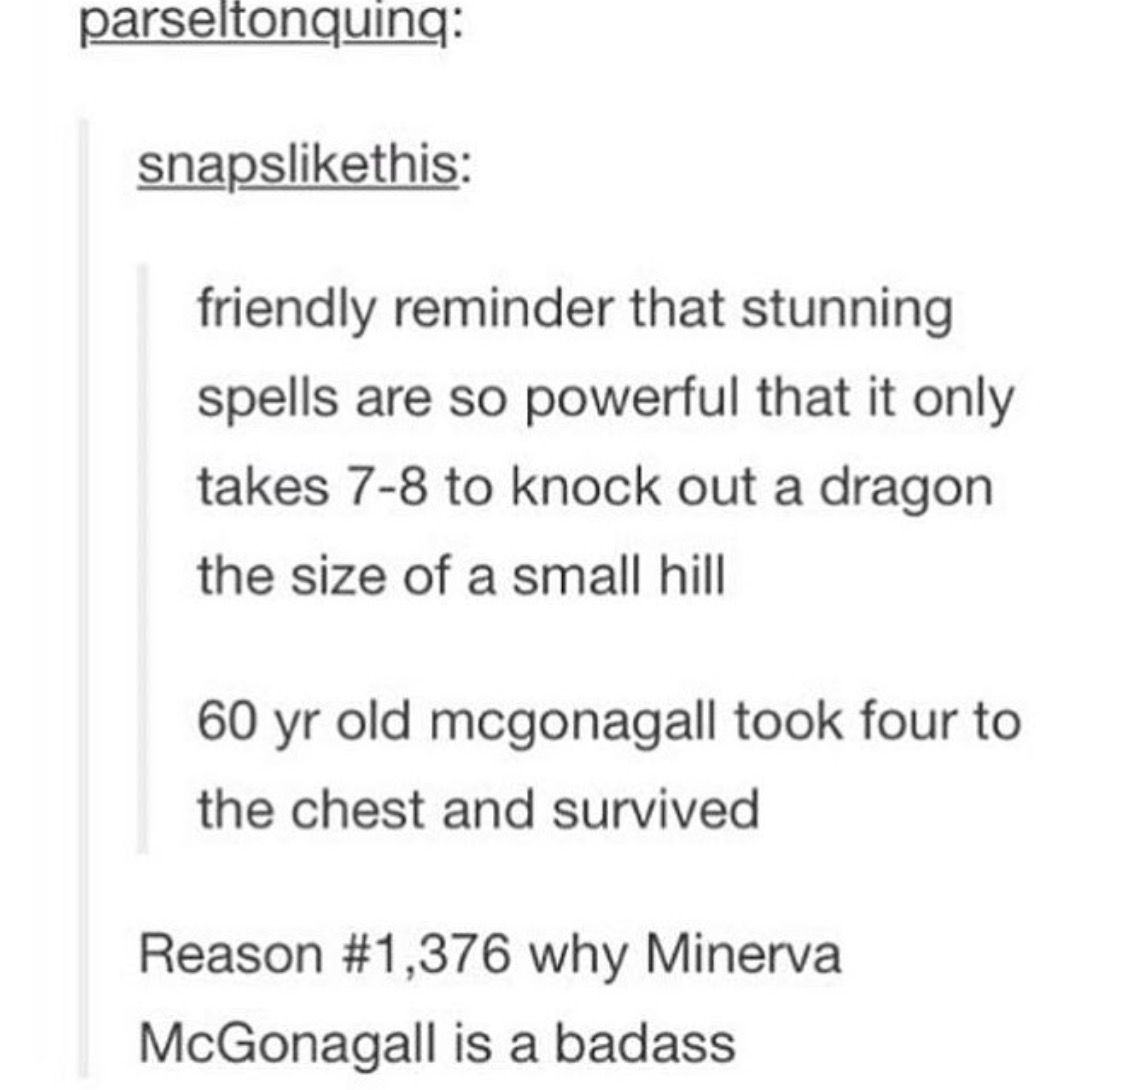 THE DRAGON? PLEASE. IT'S PATRONUS IS MINERVA MCGONAGALL.